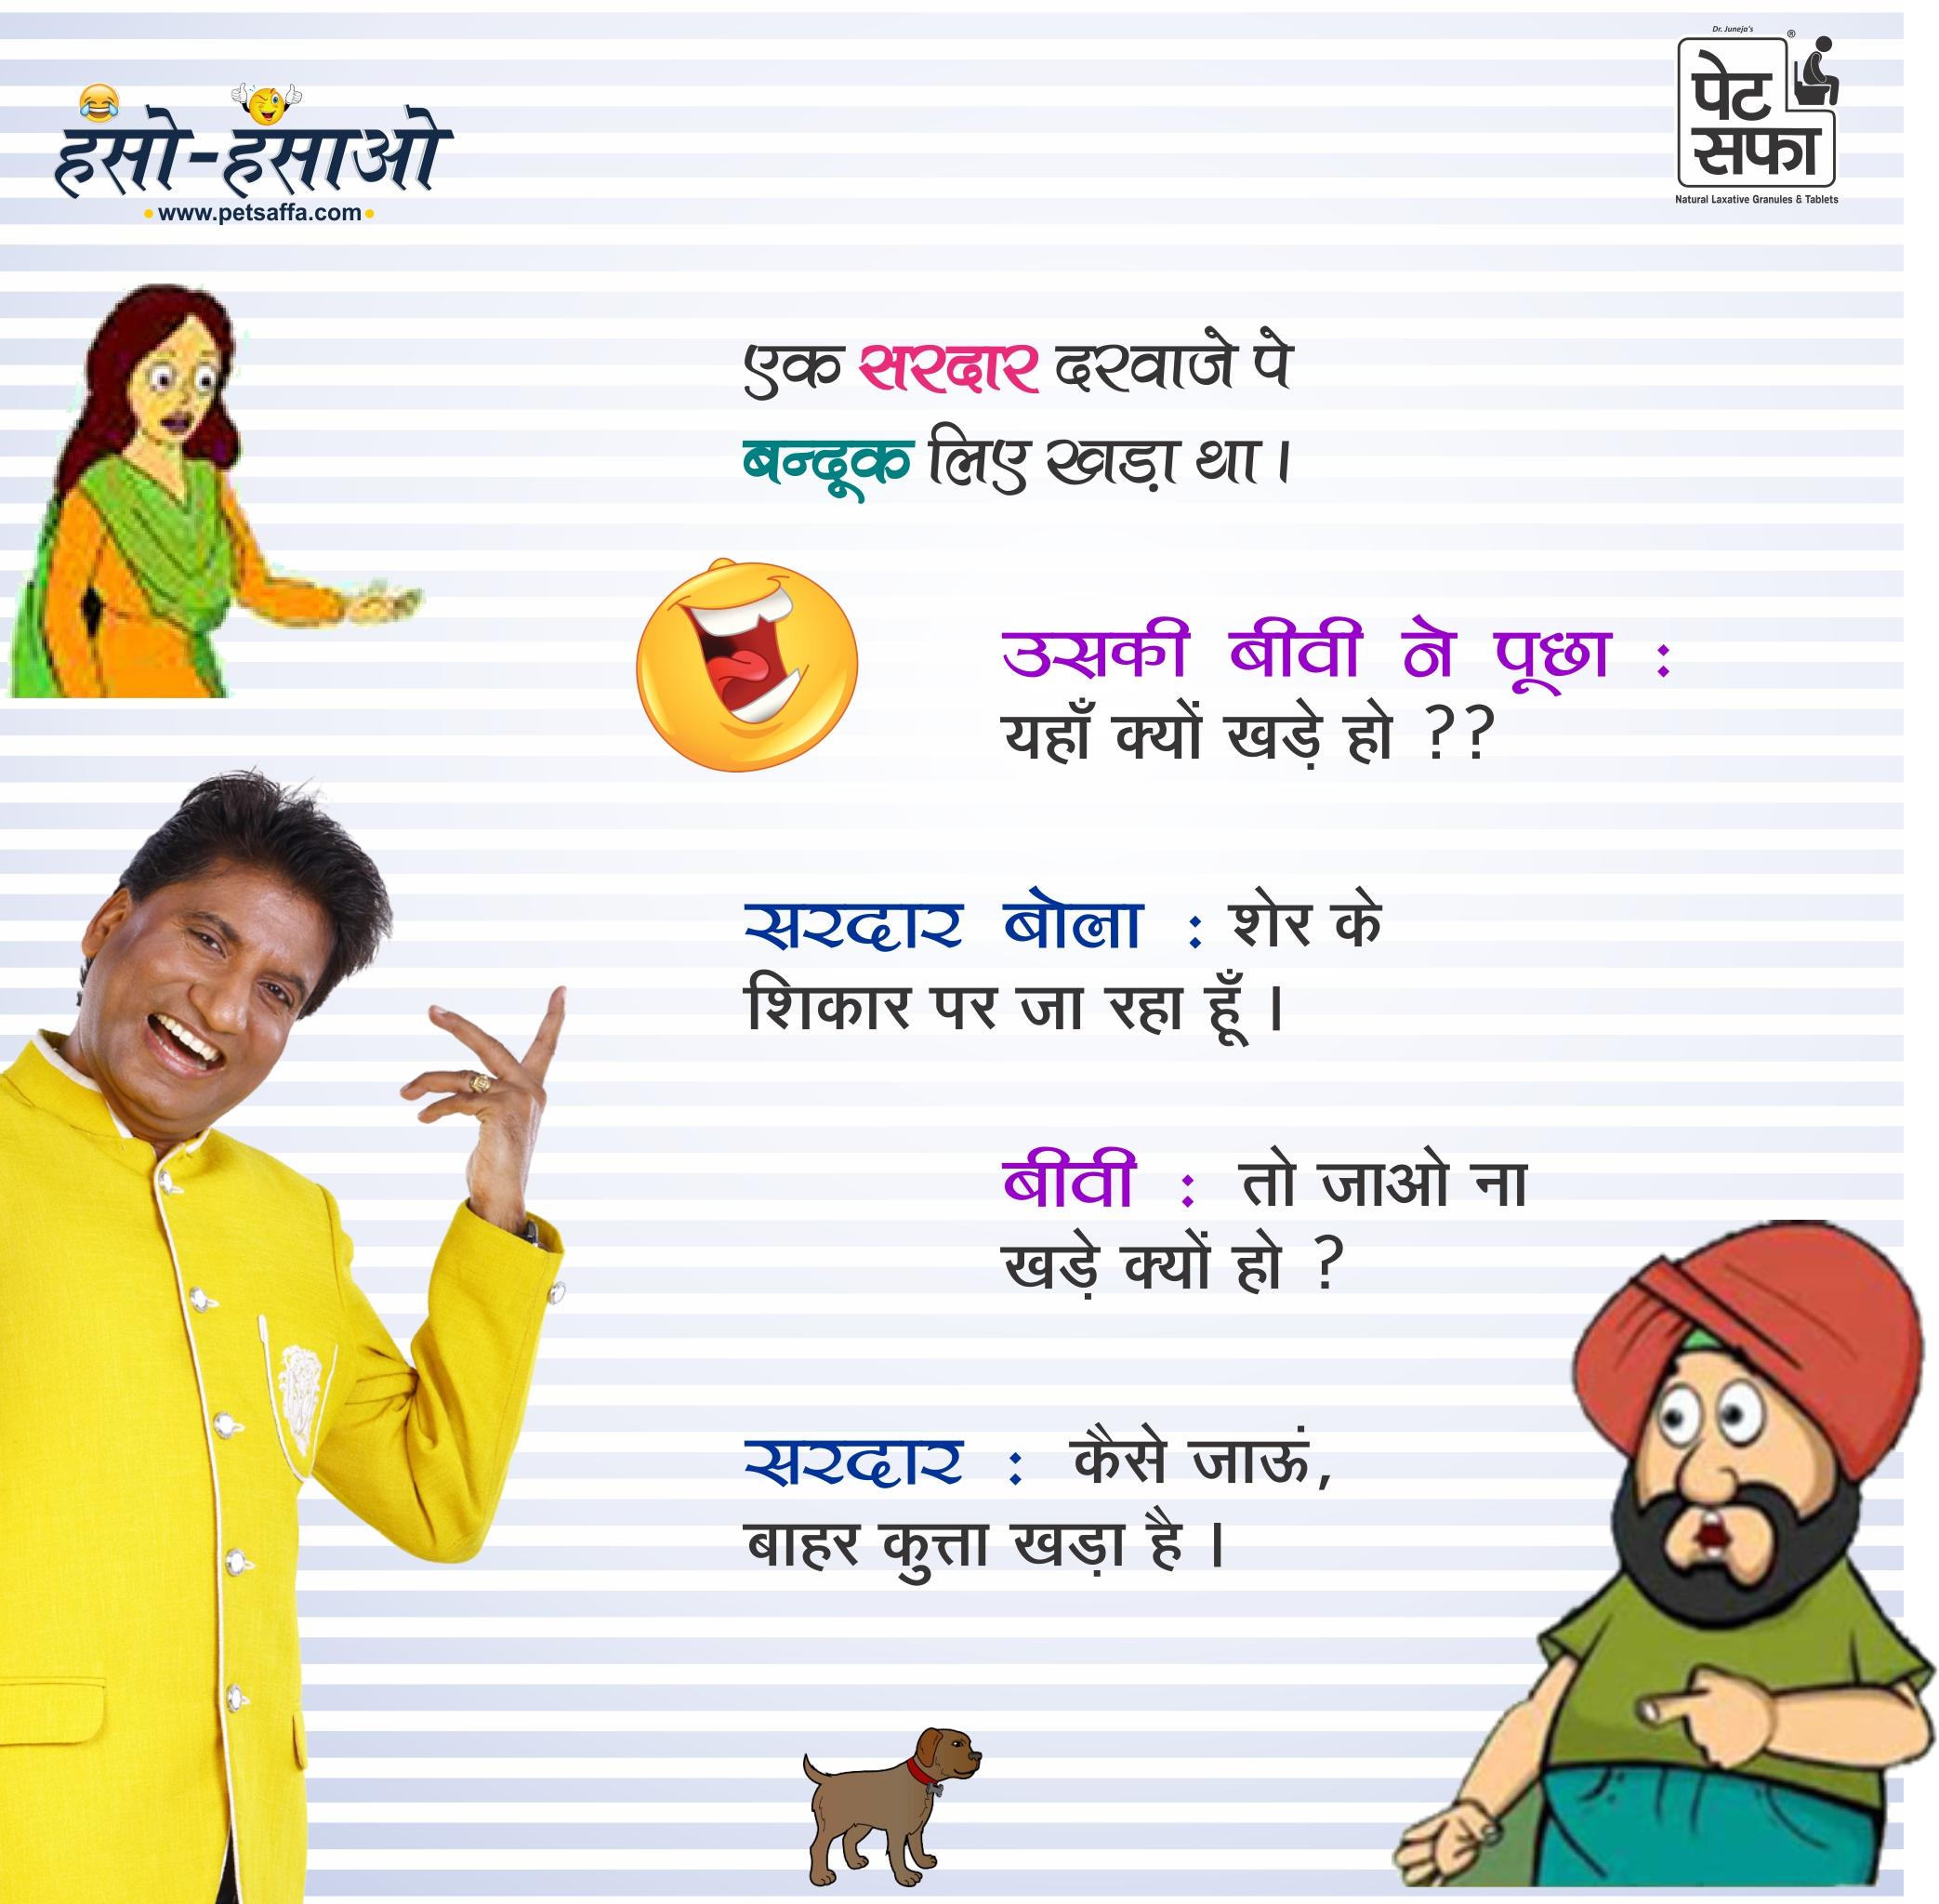 pati-patni-Jokes of the Day